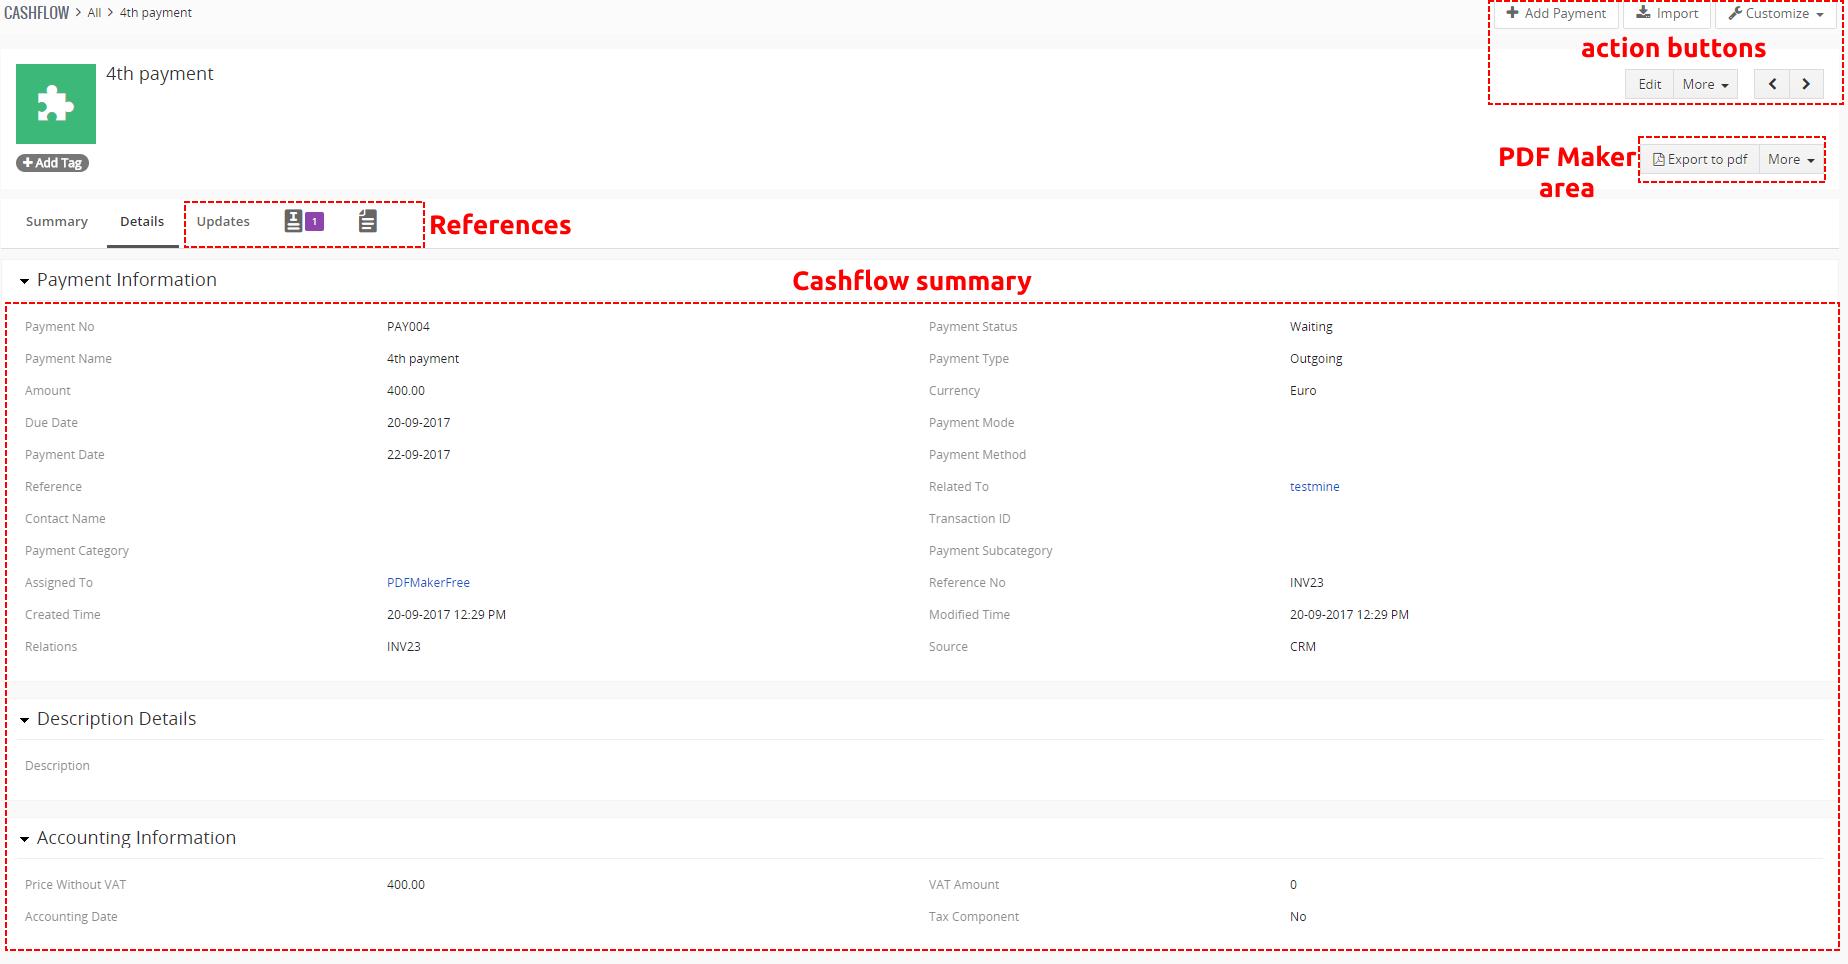 DetailView of Cashflow